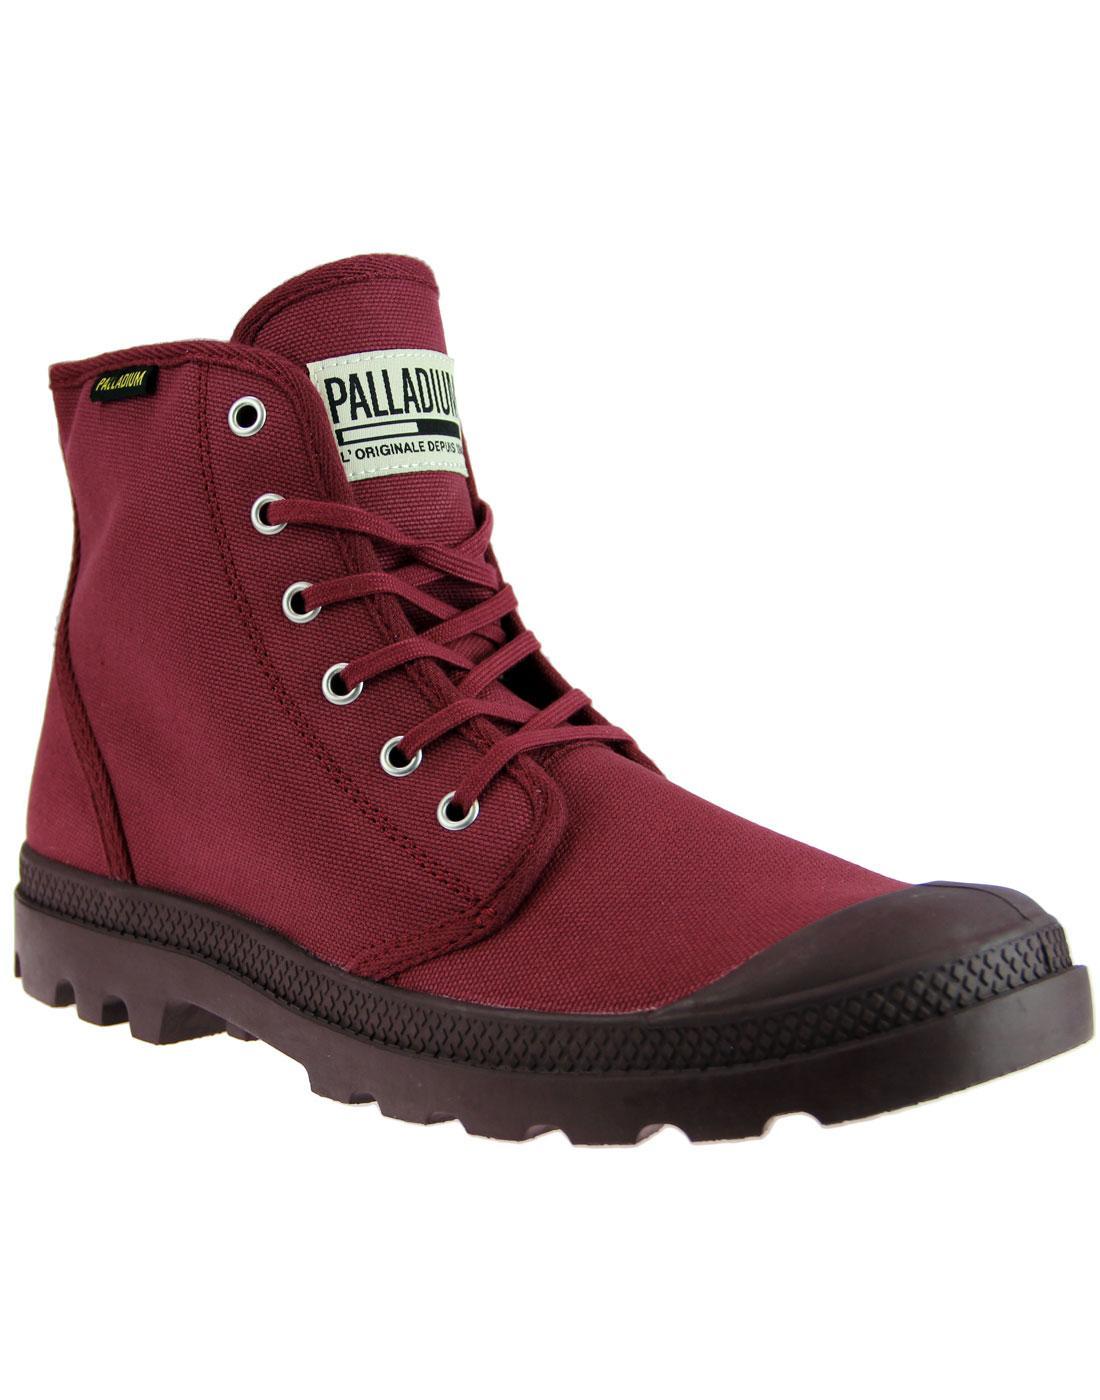 Pampa Hi Original PALLADIUM Men's Boots CABERNET